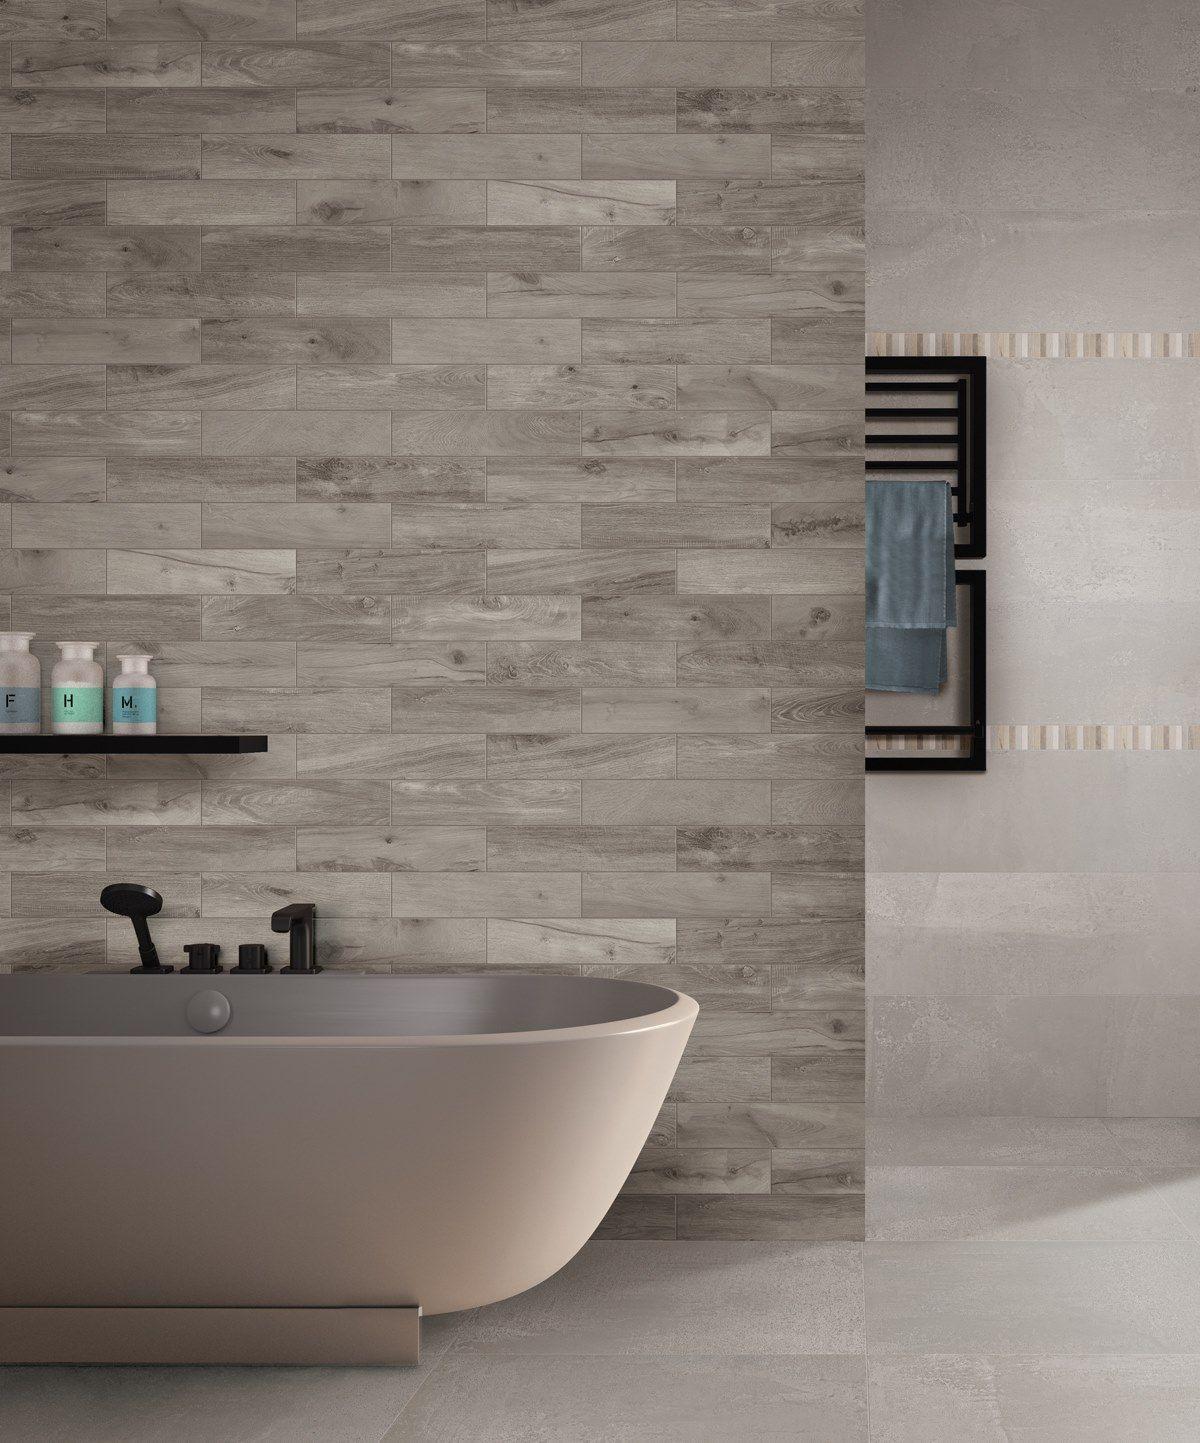 1946 yellow and grey tile bathroom - Wall Tile In Grey